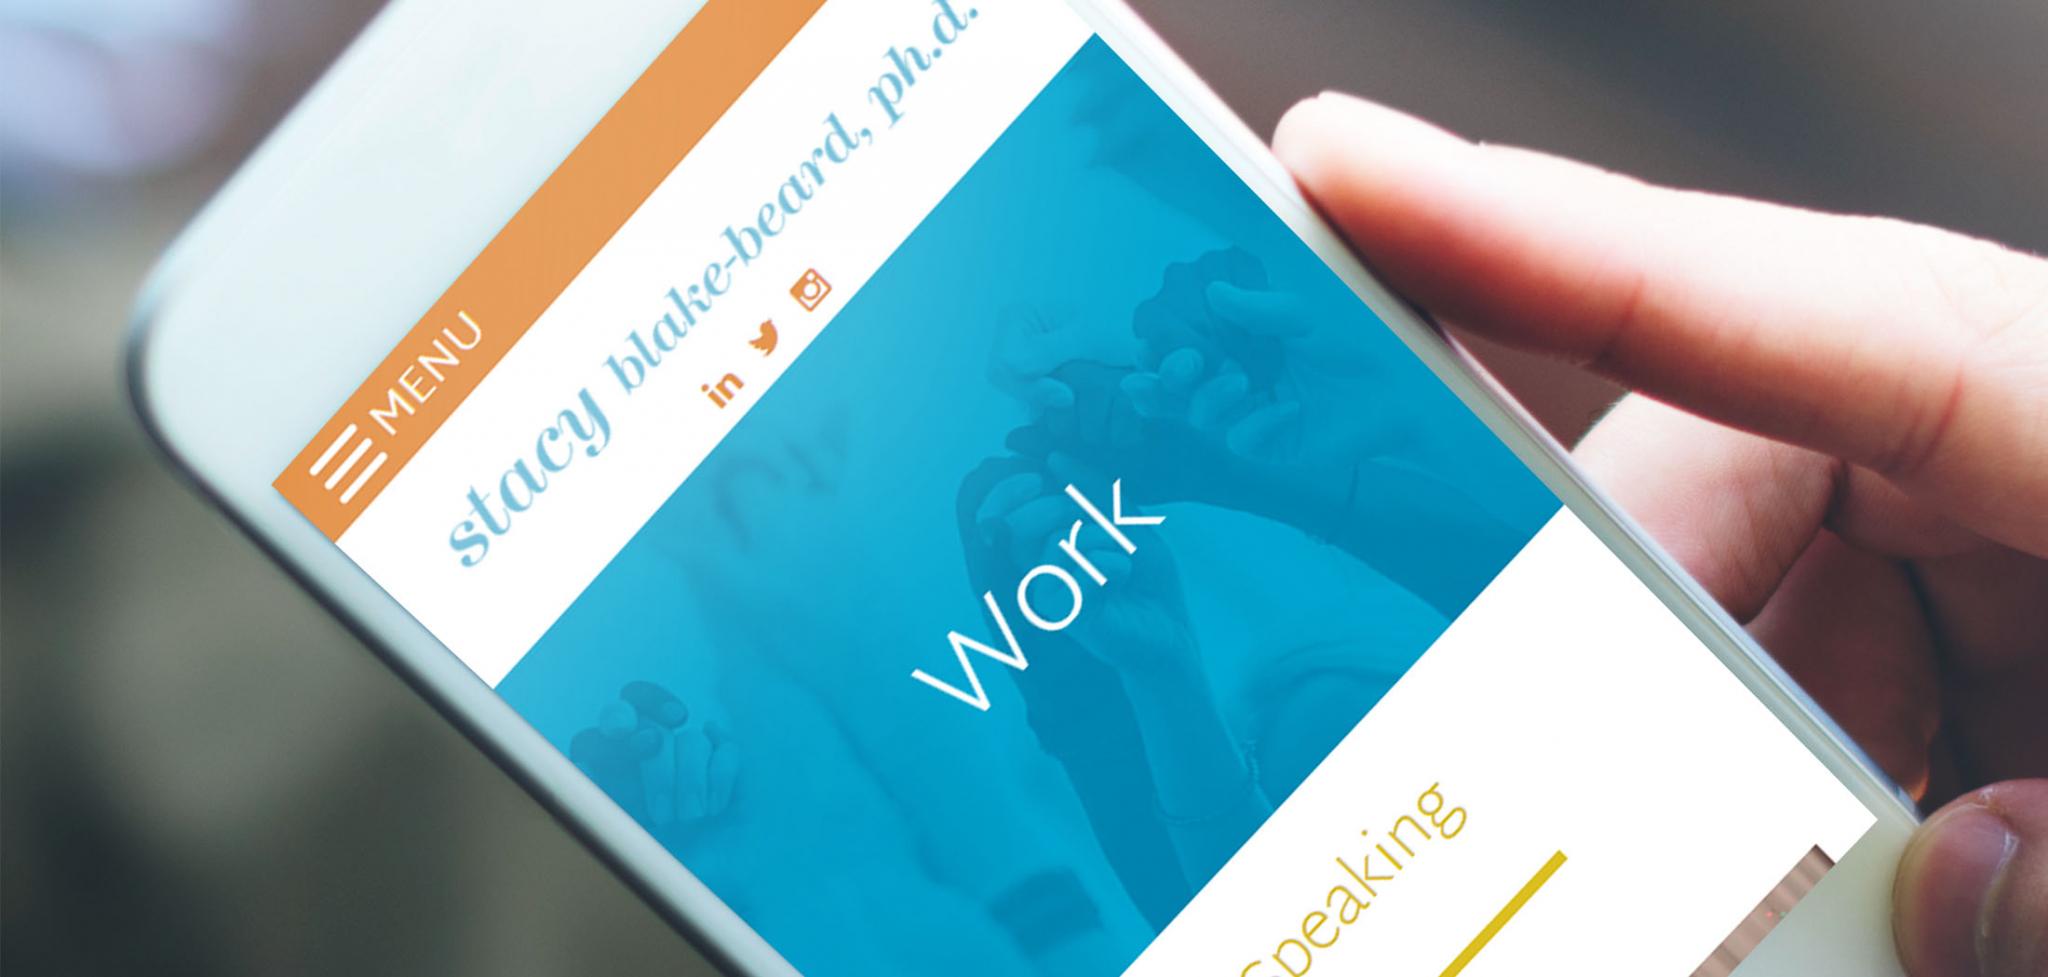 Leadership Consultant Website Designs for Mobile